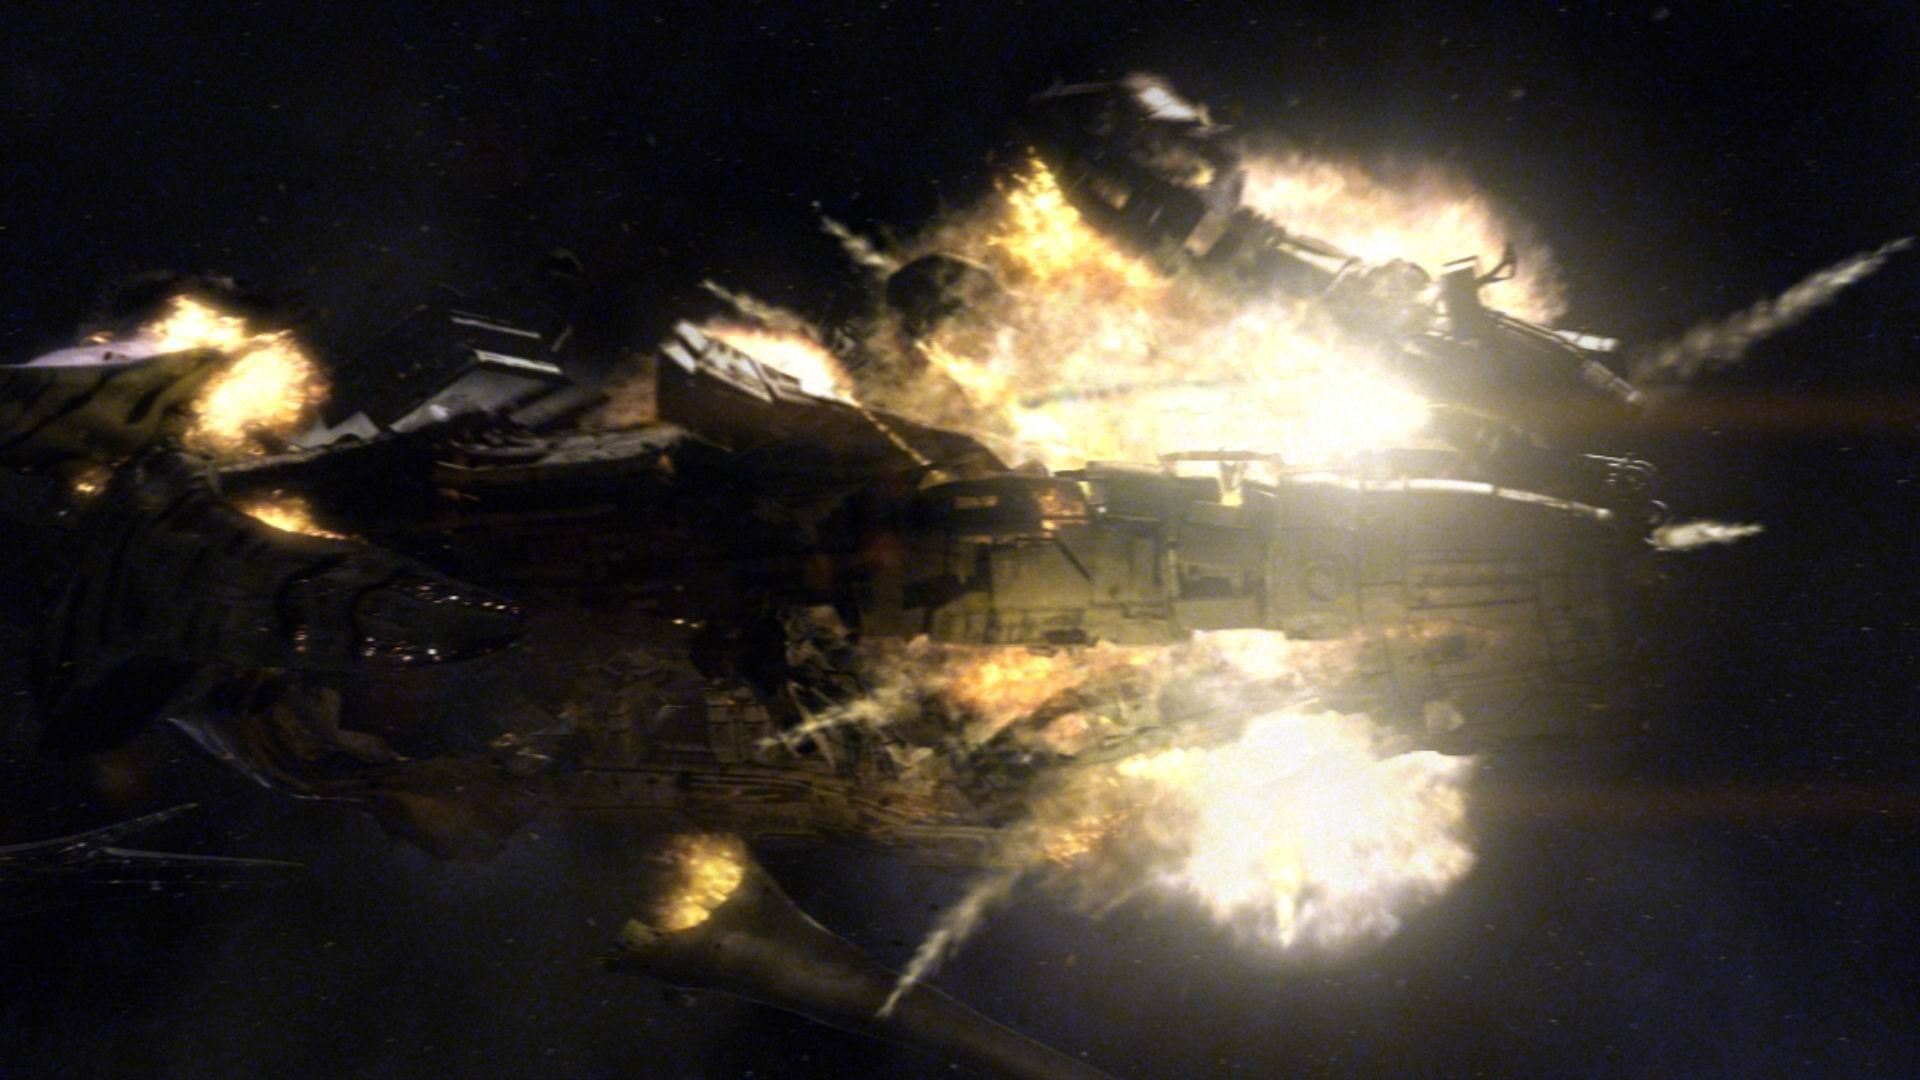 Battlestar Galactica Wallpaper for Android – Wallpapers